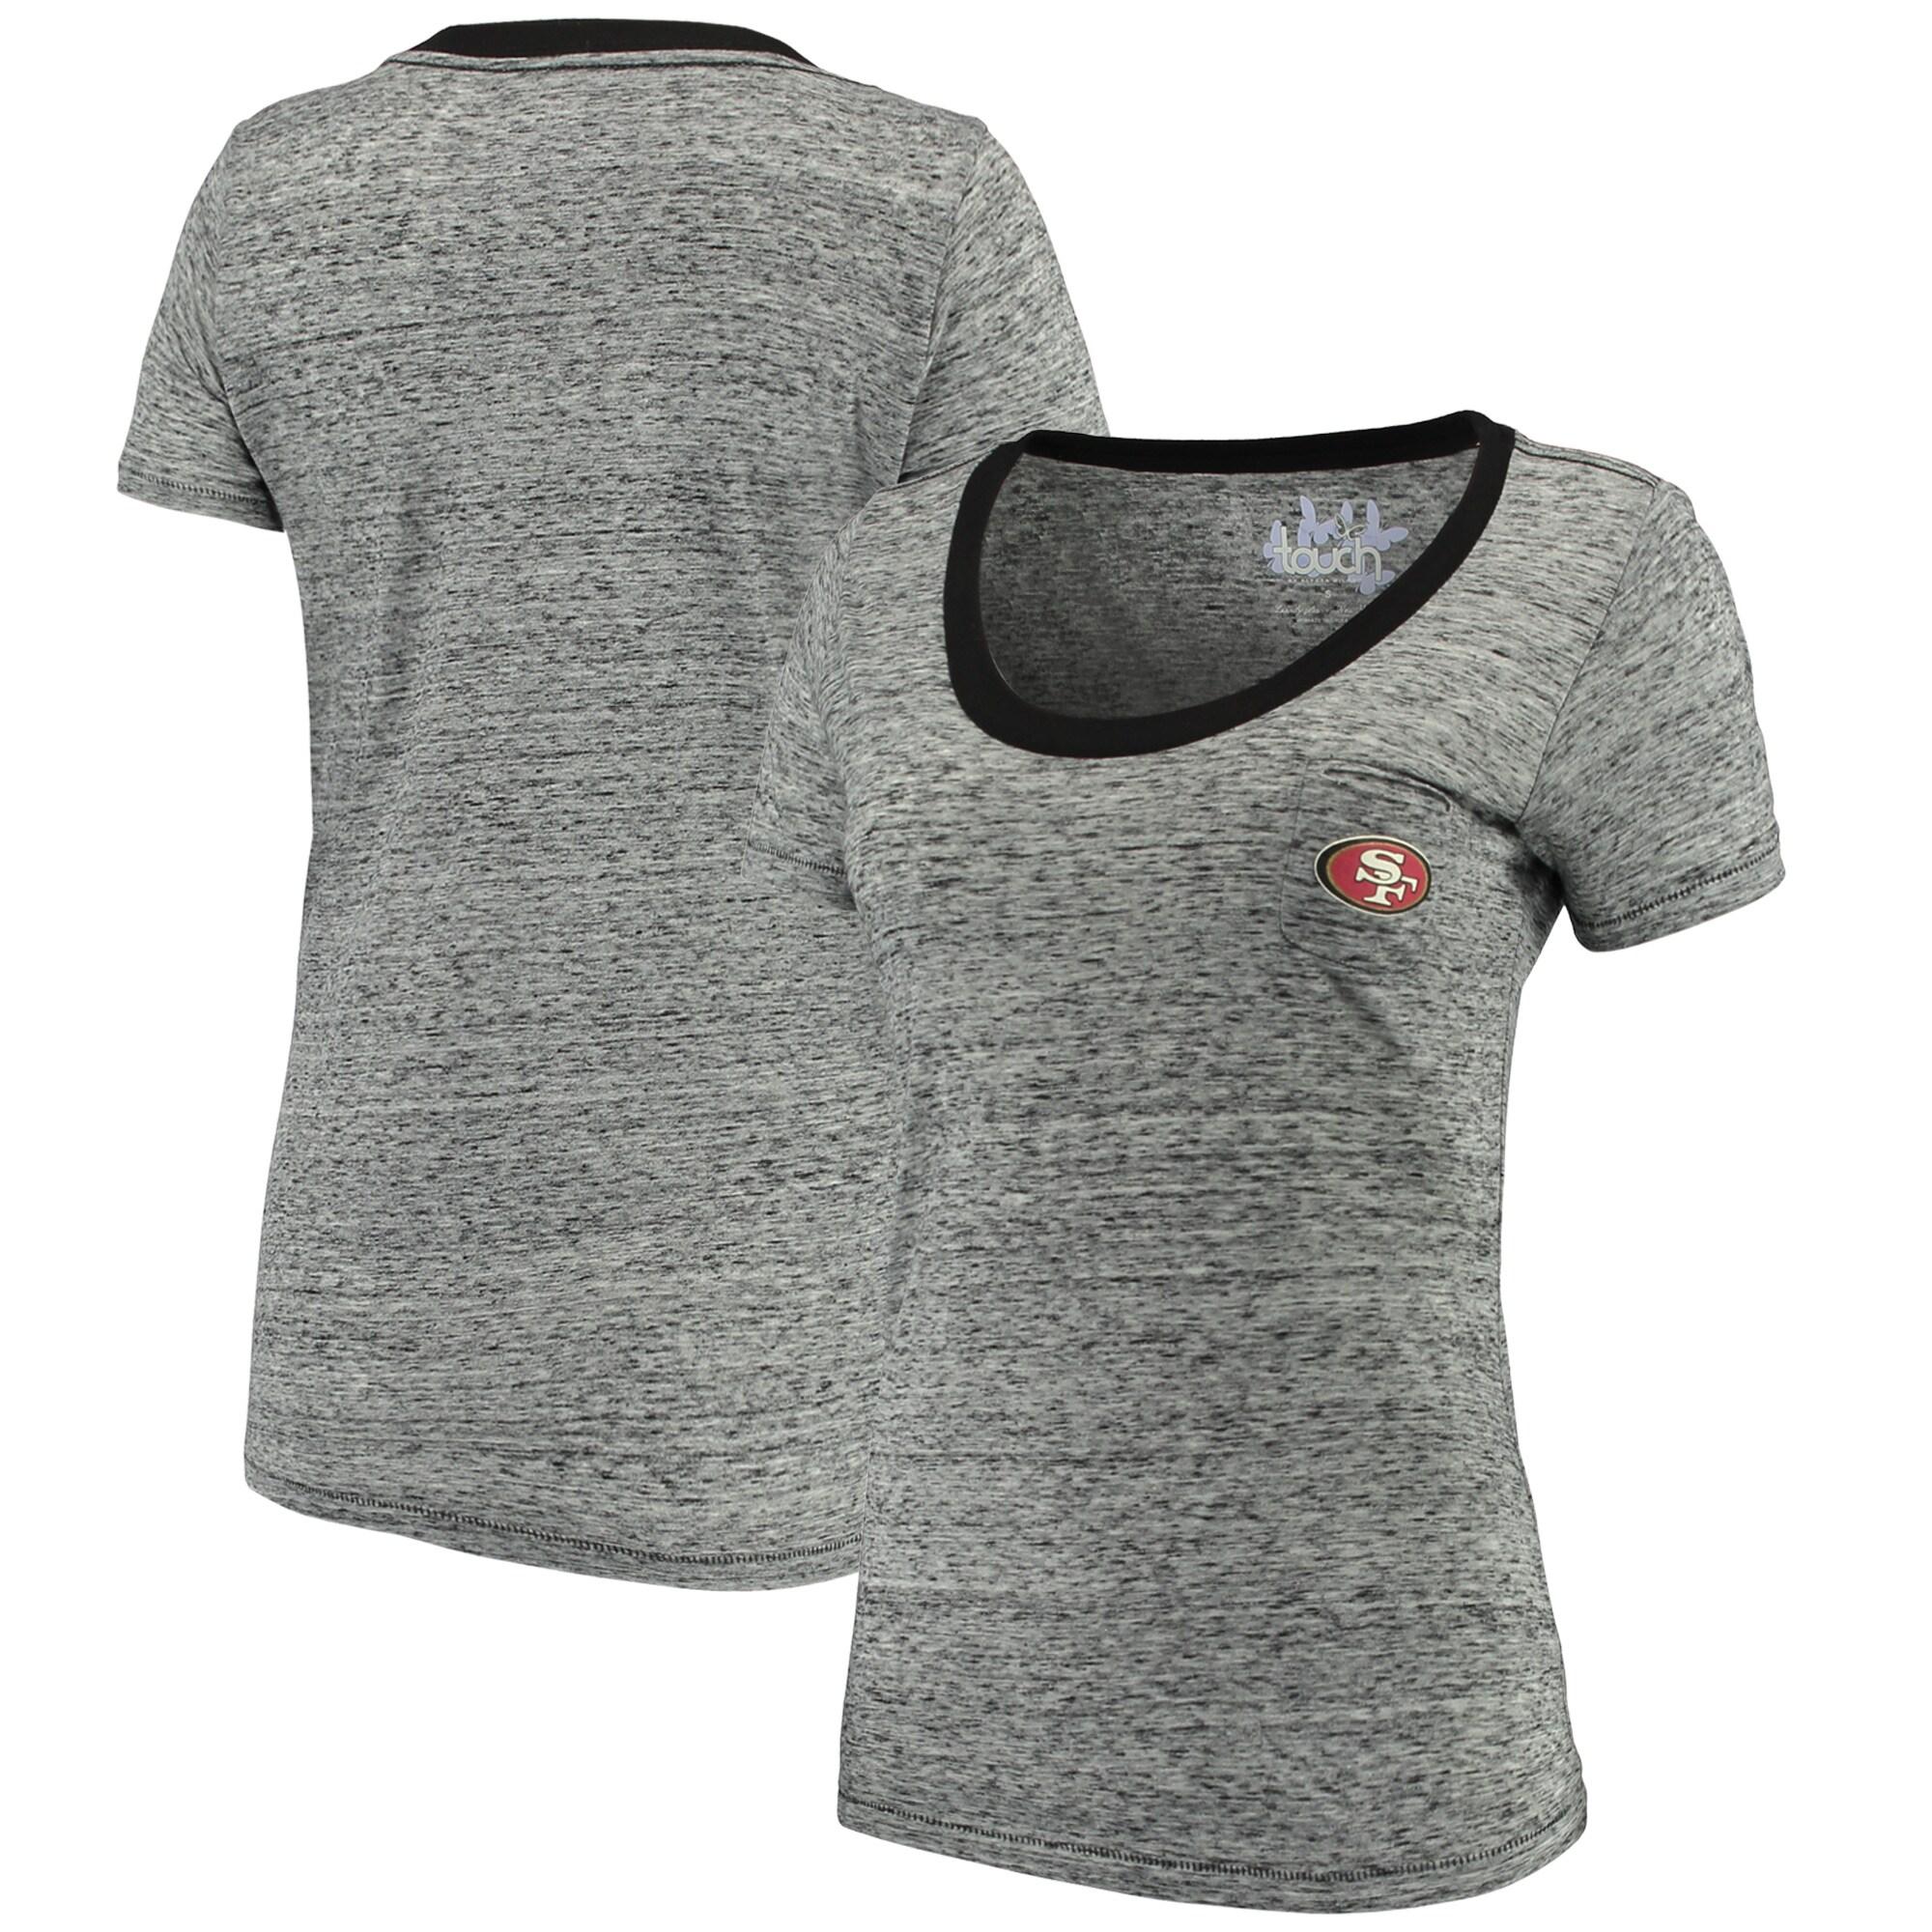 San Francisco 49ers Touch by Alyssa Milano Women's Autumn Scoop Neck T-Shirt - Heathered Black